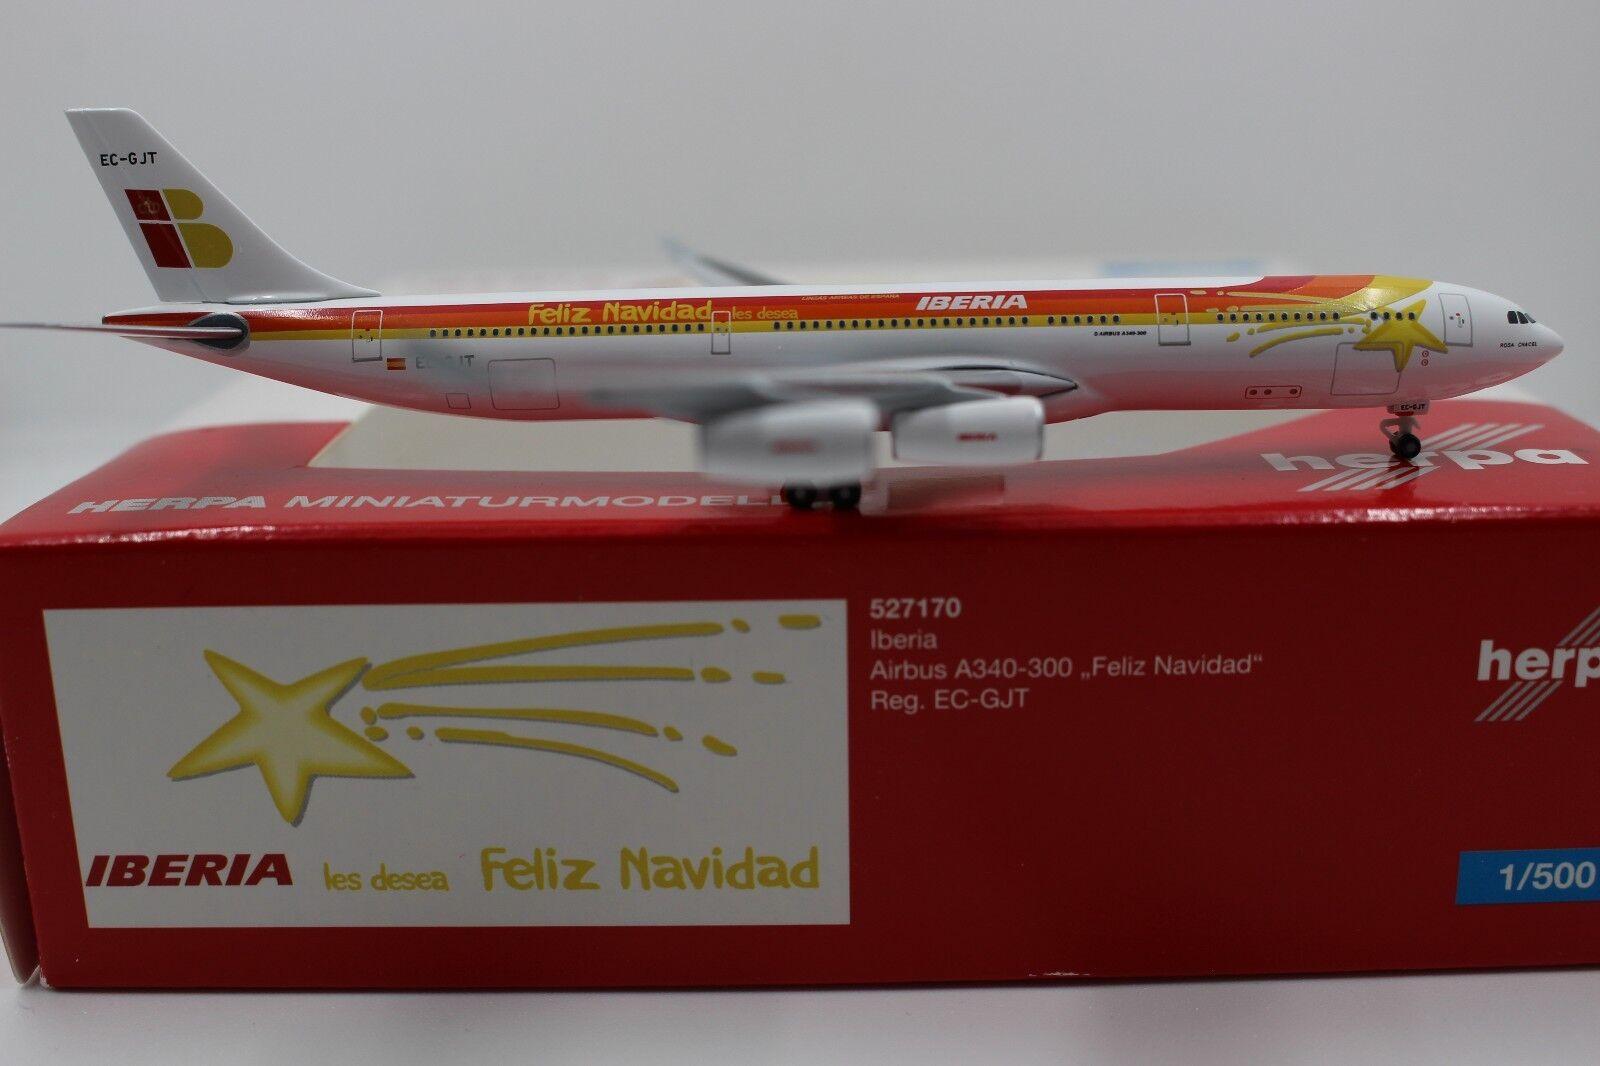 Herpa Wings 1 500 Iberia AIRBUS a340-300 Feliz Navidad (527170) Limited Edition